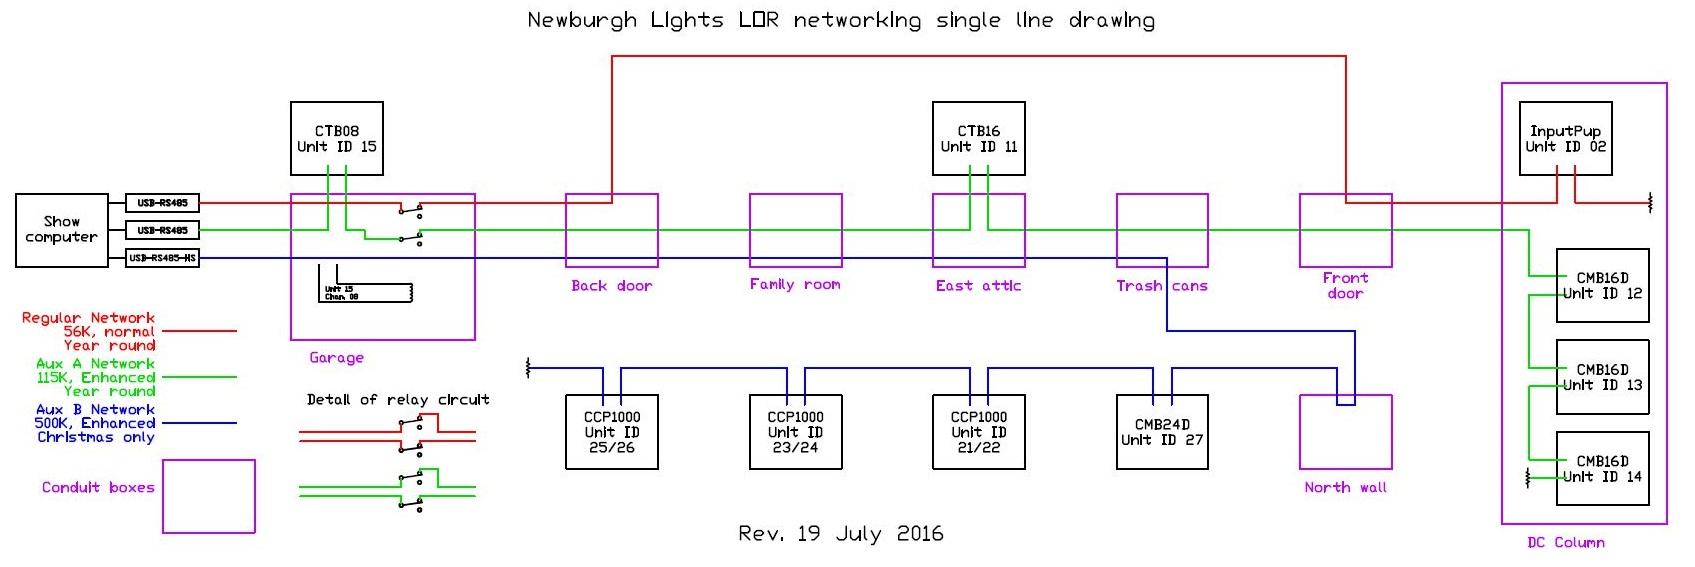 LOR_Network_2016-07-19.jpg